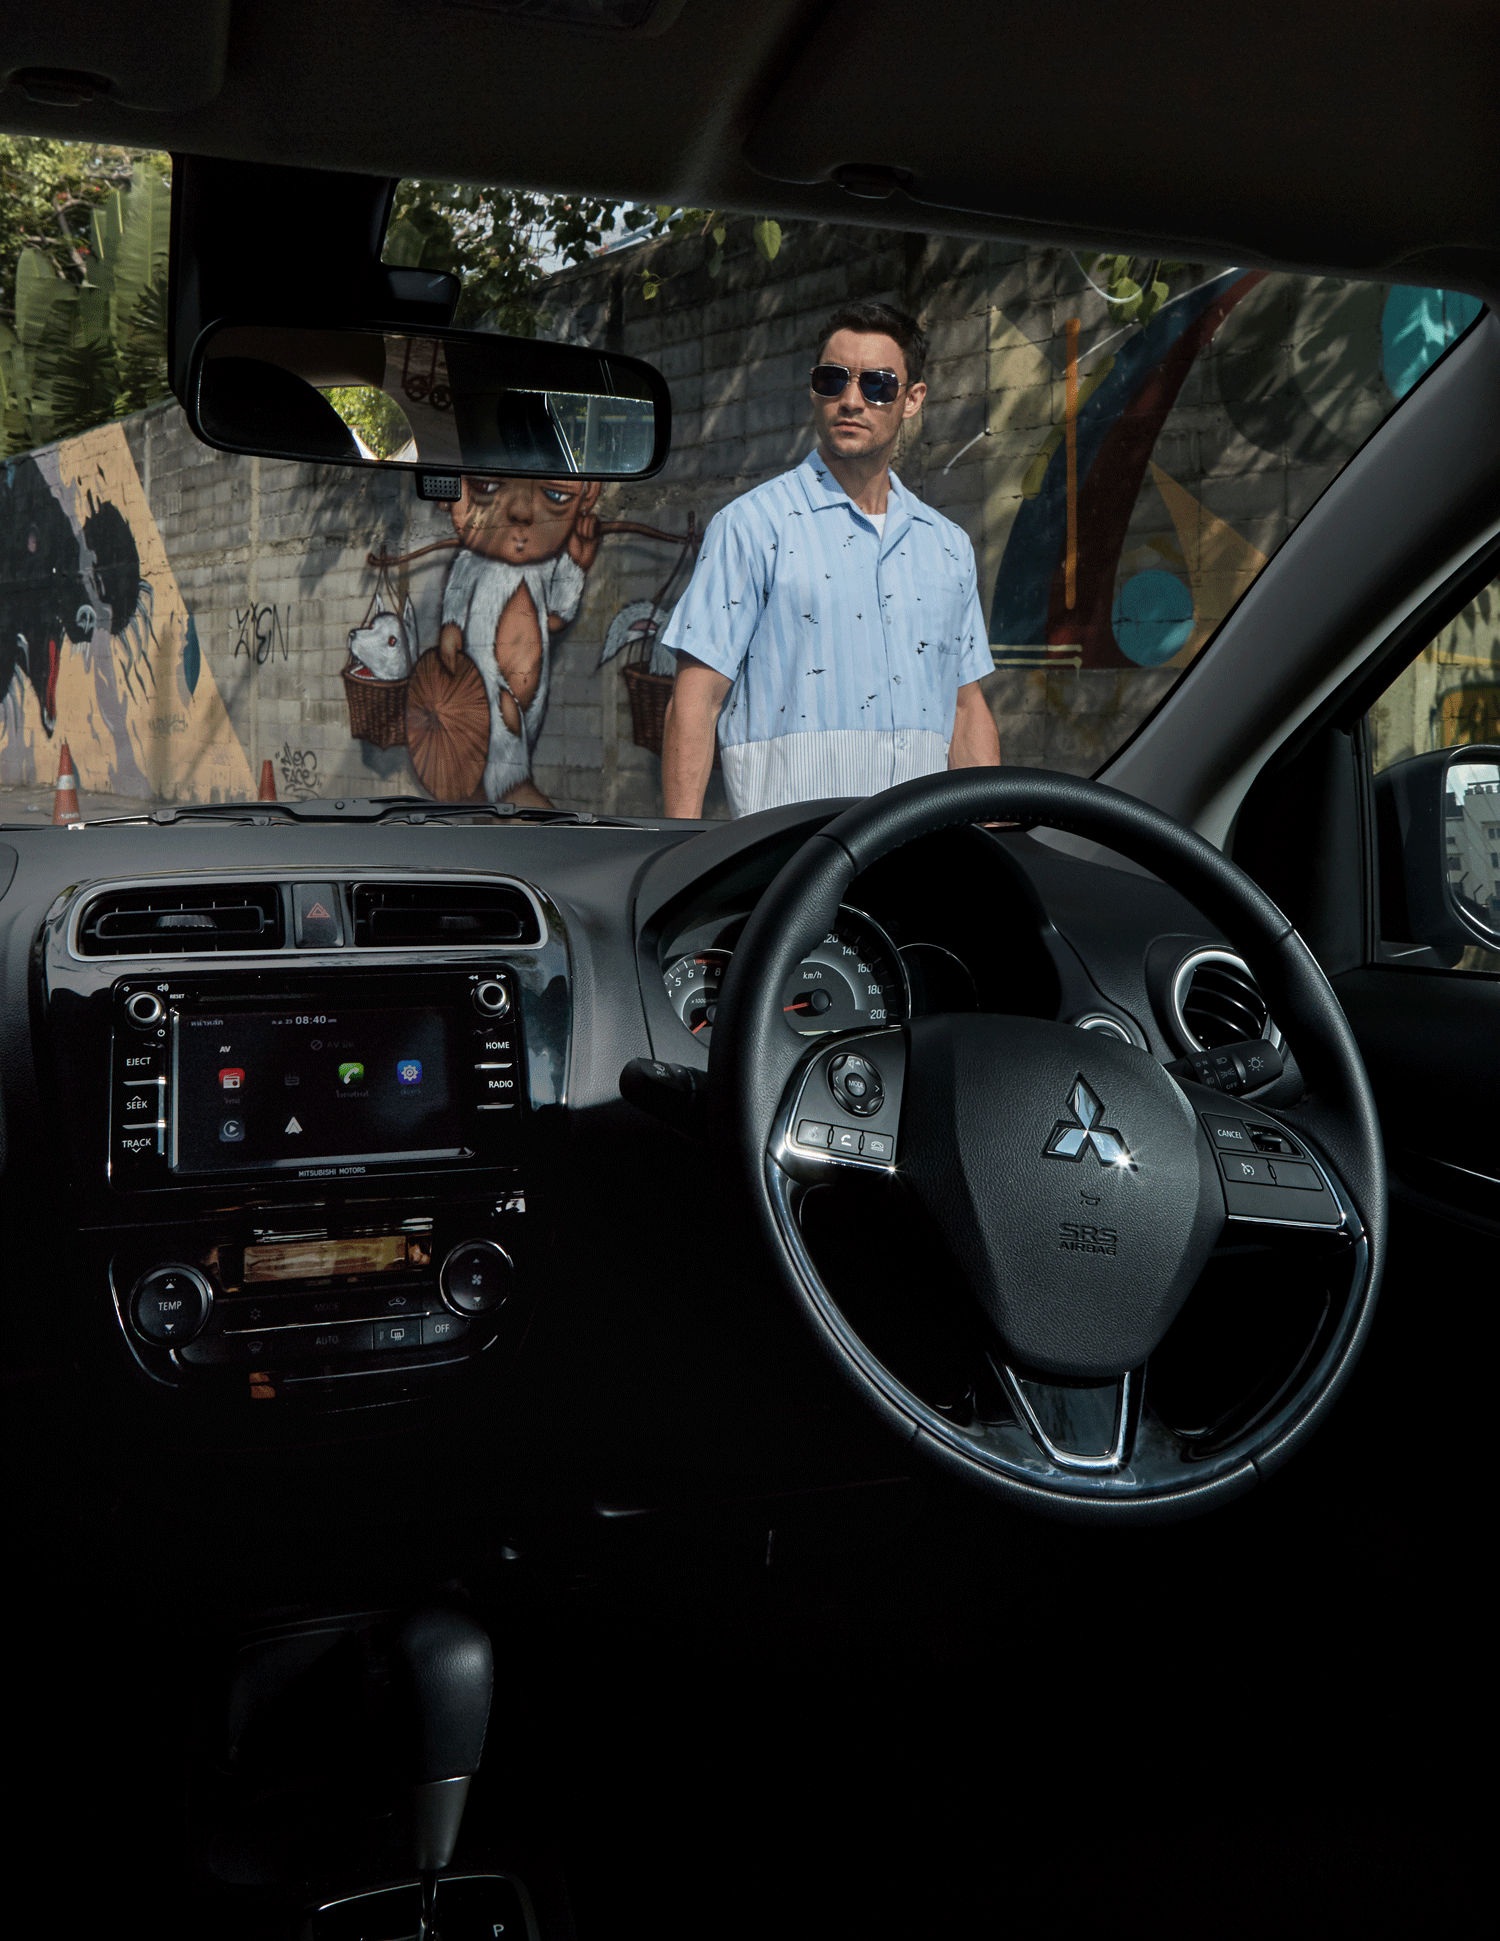 car : Mitsubishi NEW Attrage  shirt : Everyday Karmakamet / sunglasses : TAVAT